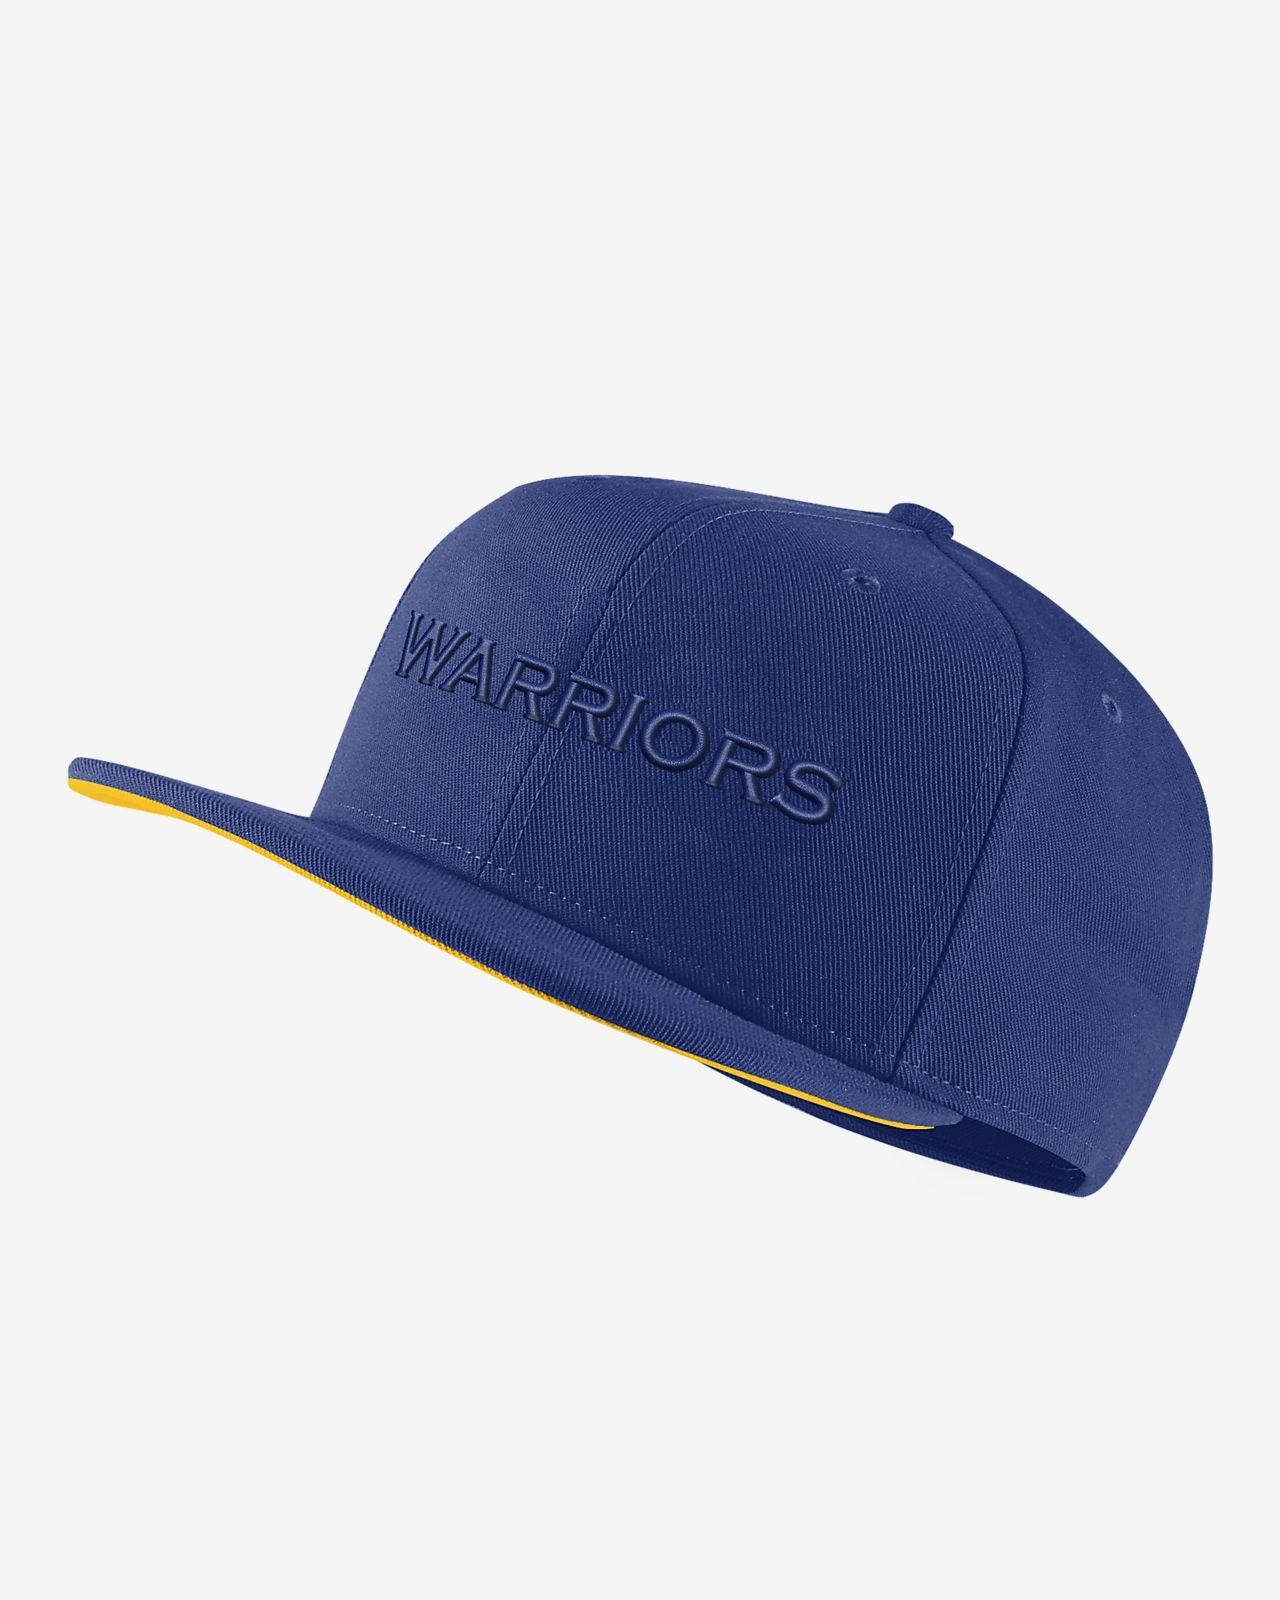 Golden State Warriors Nike AeroBill NBA-Cap (Unisex)